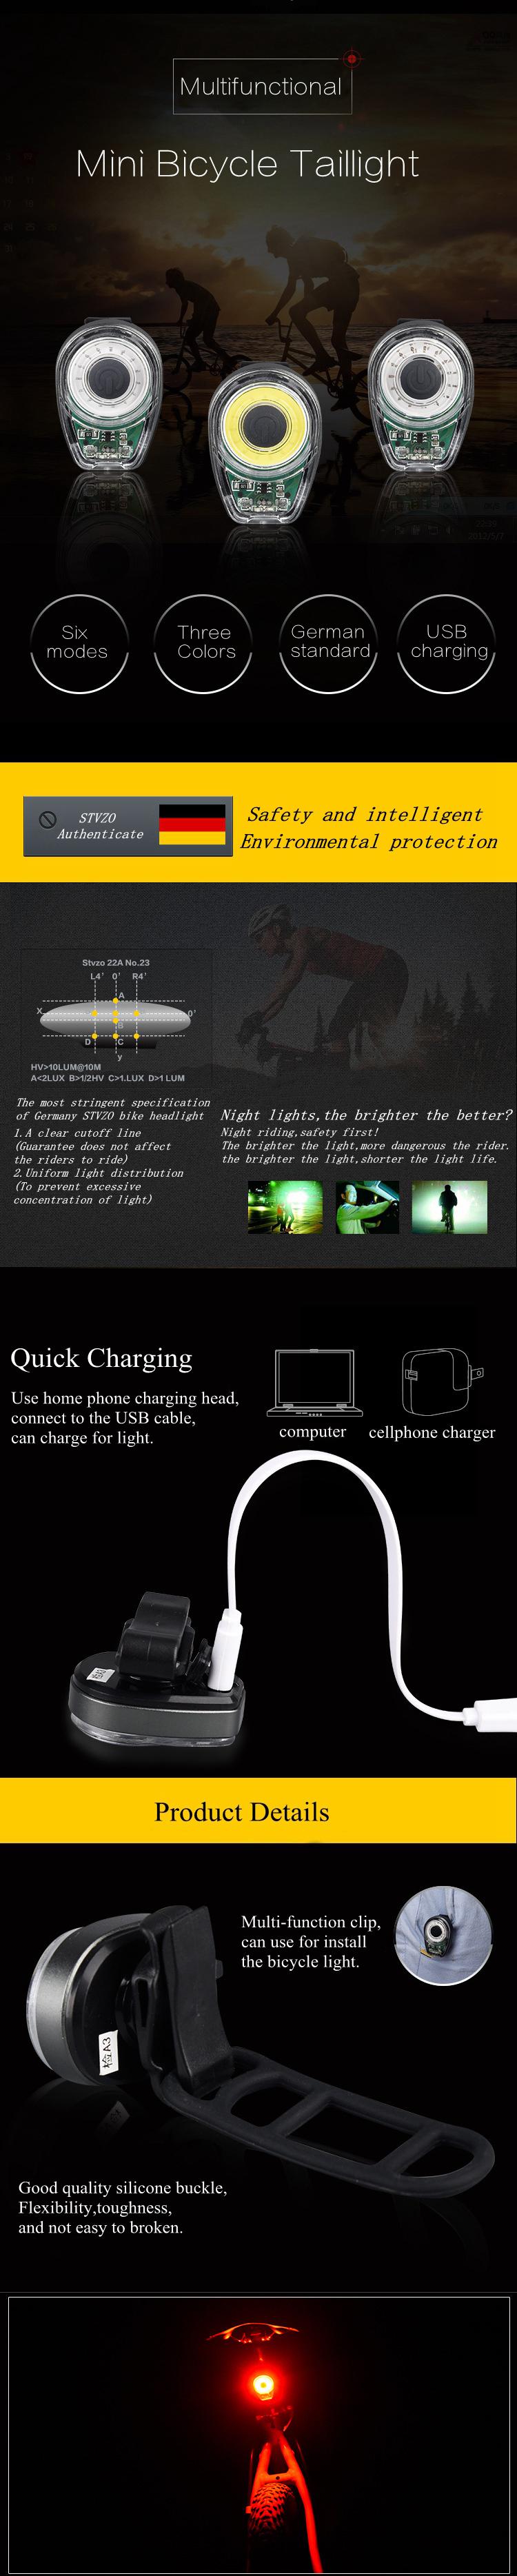 XANESКомплектдлявелосипедаLightSFL02 600LM T6 Смарт-индукционный передний свет STL02 Смартфон USB-перезаряжаемый - фото 4